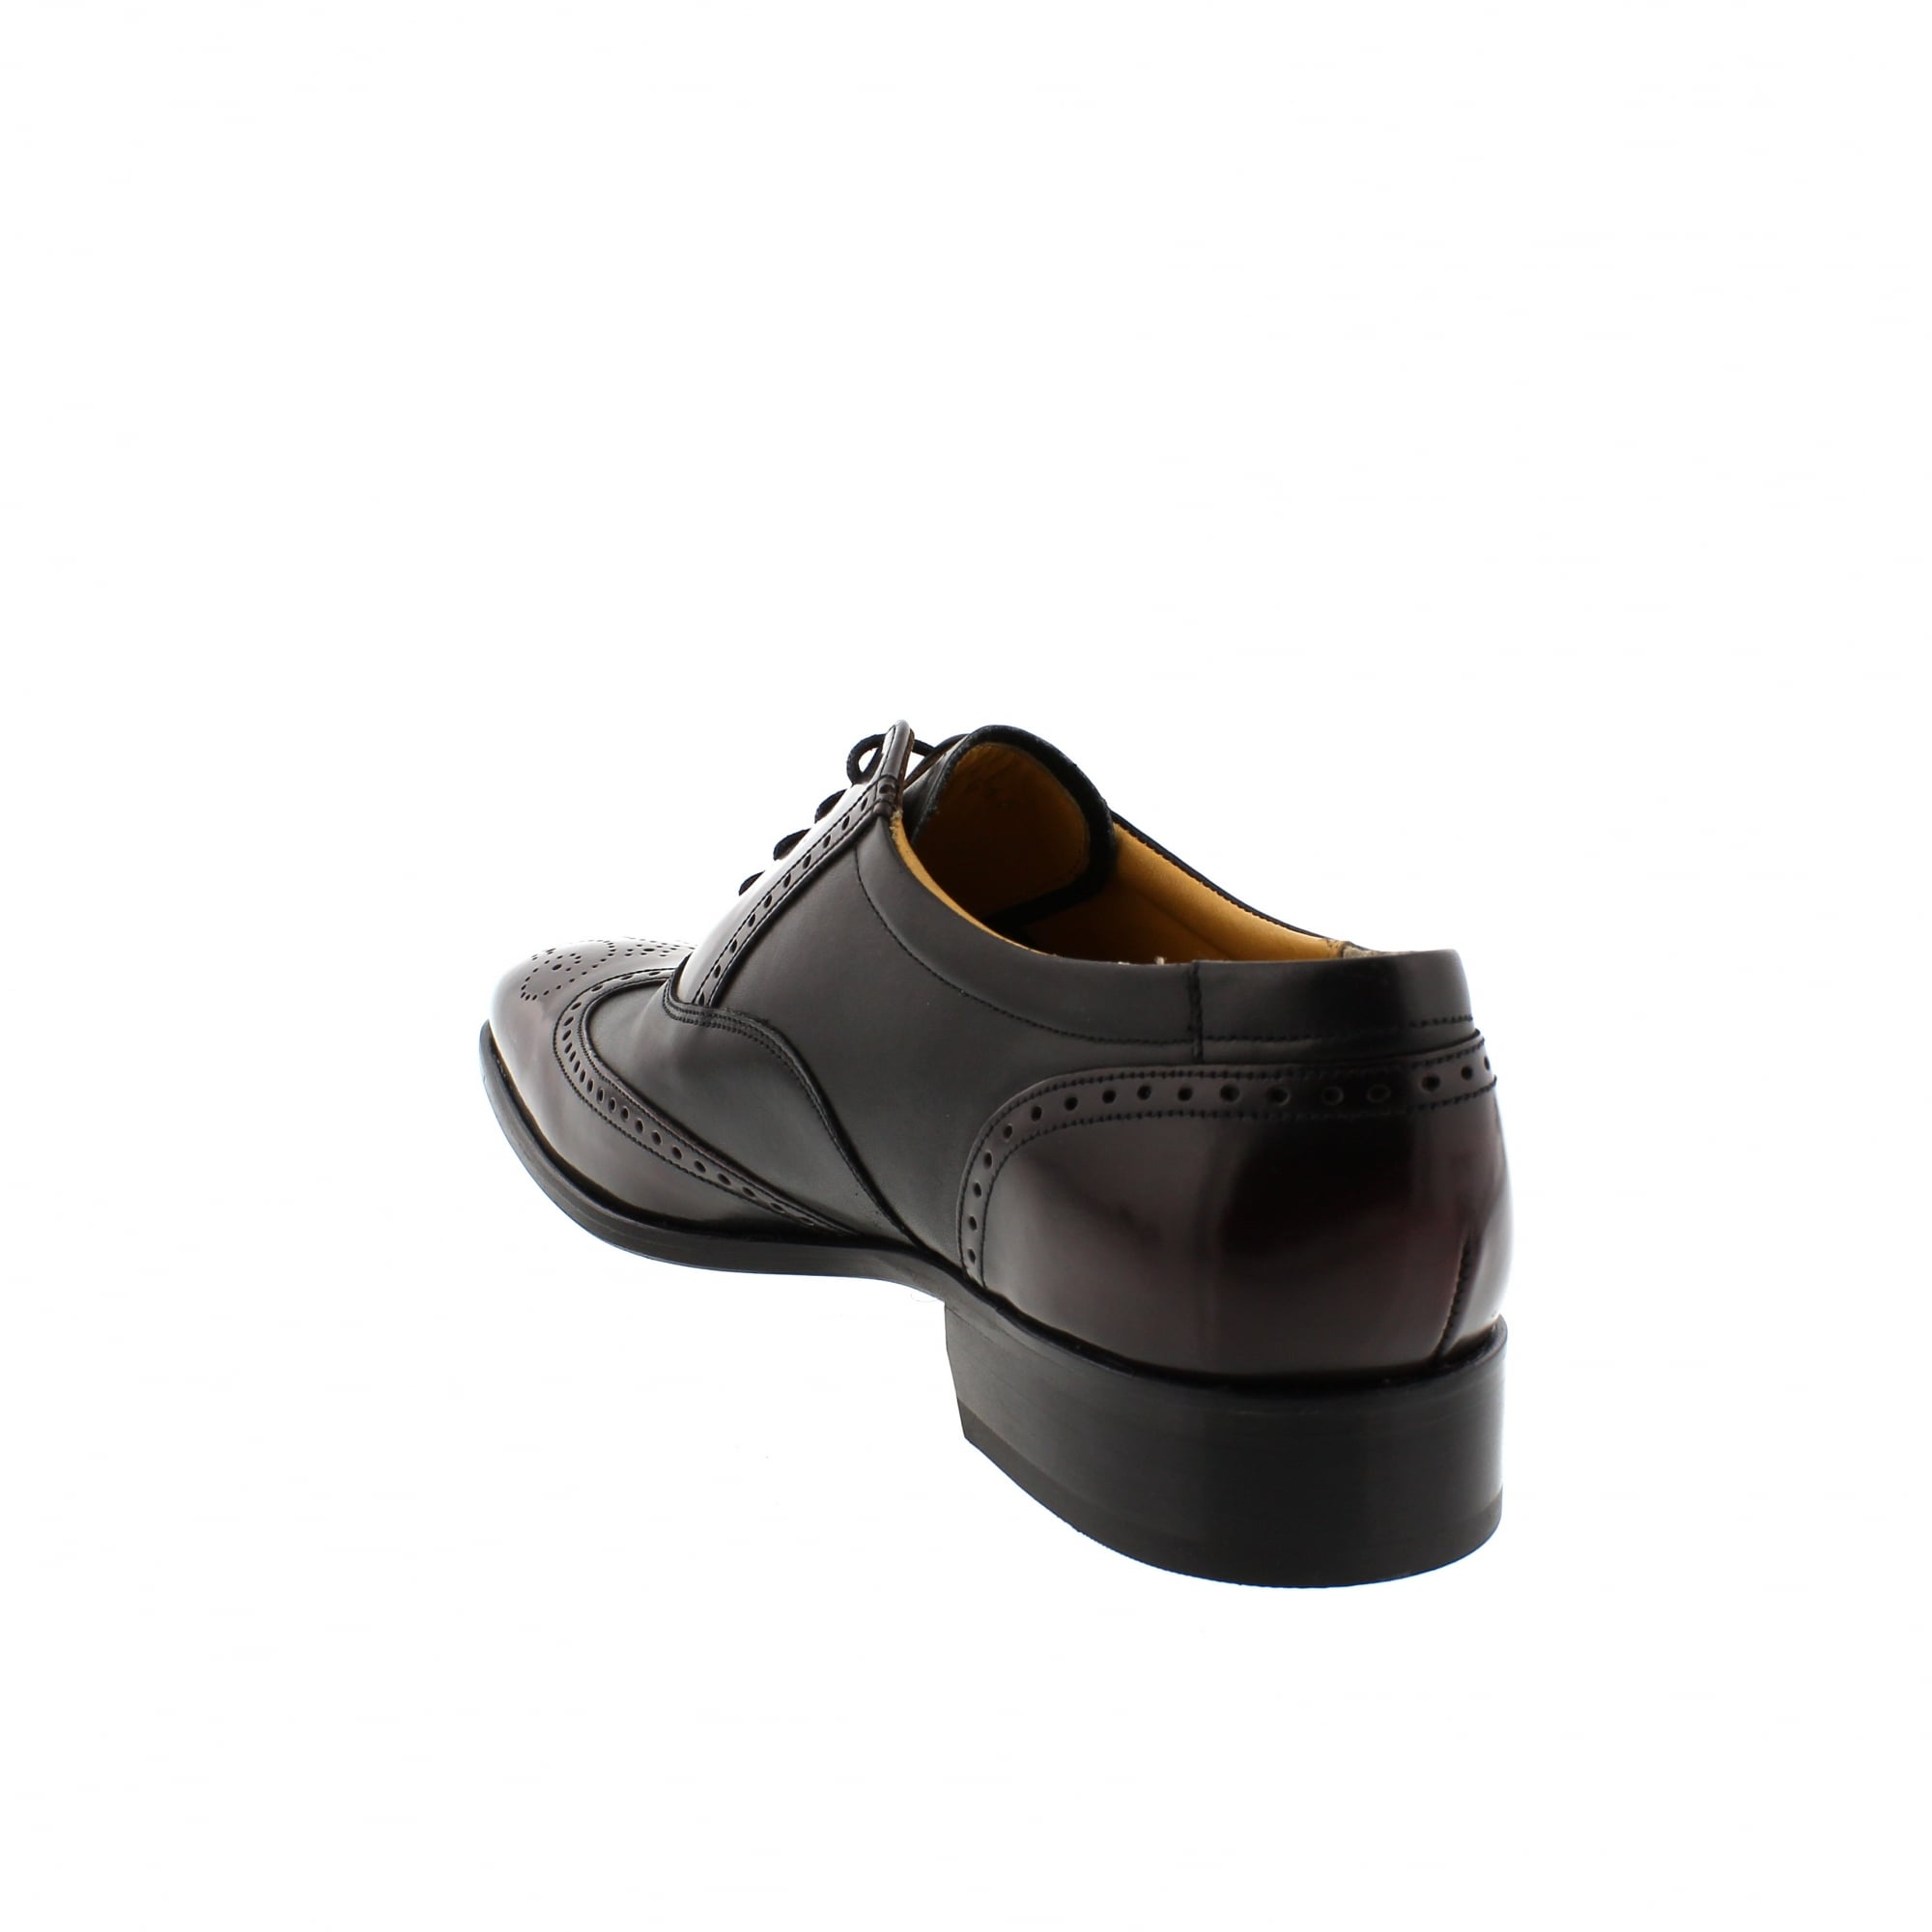 bdbe227570b6a Barker Dartford F | 132286 - Mens from Rogerson Shoes UK